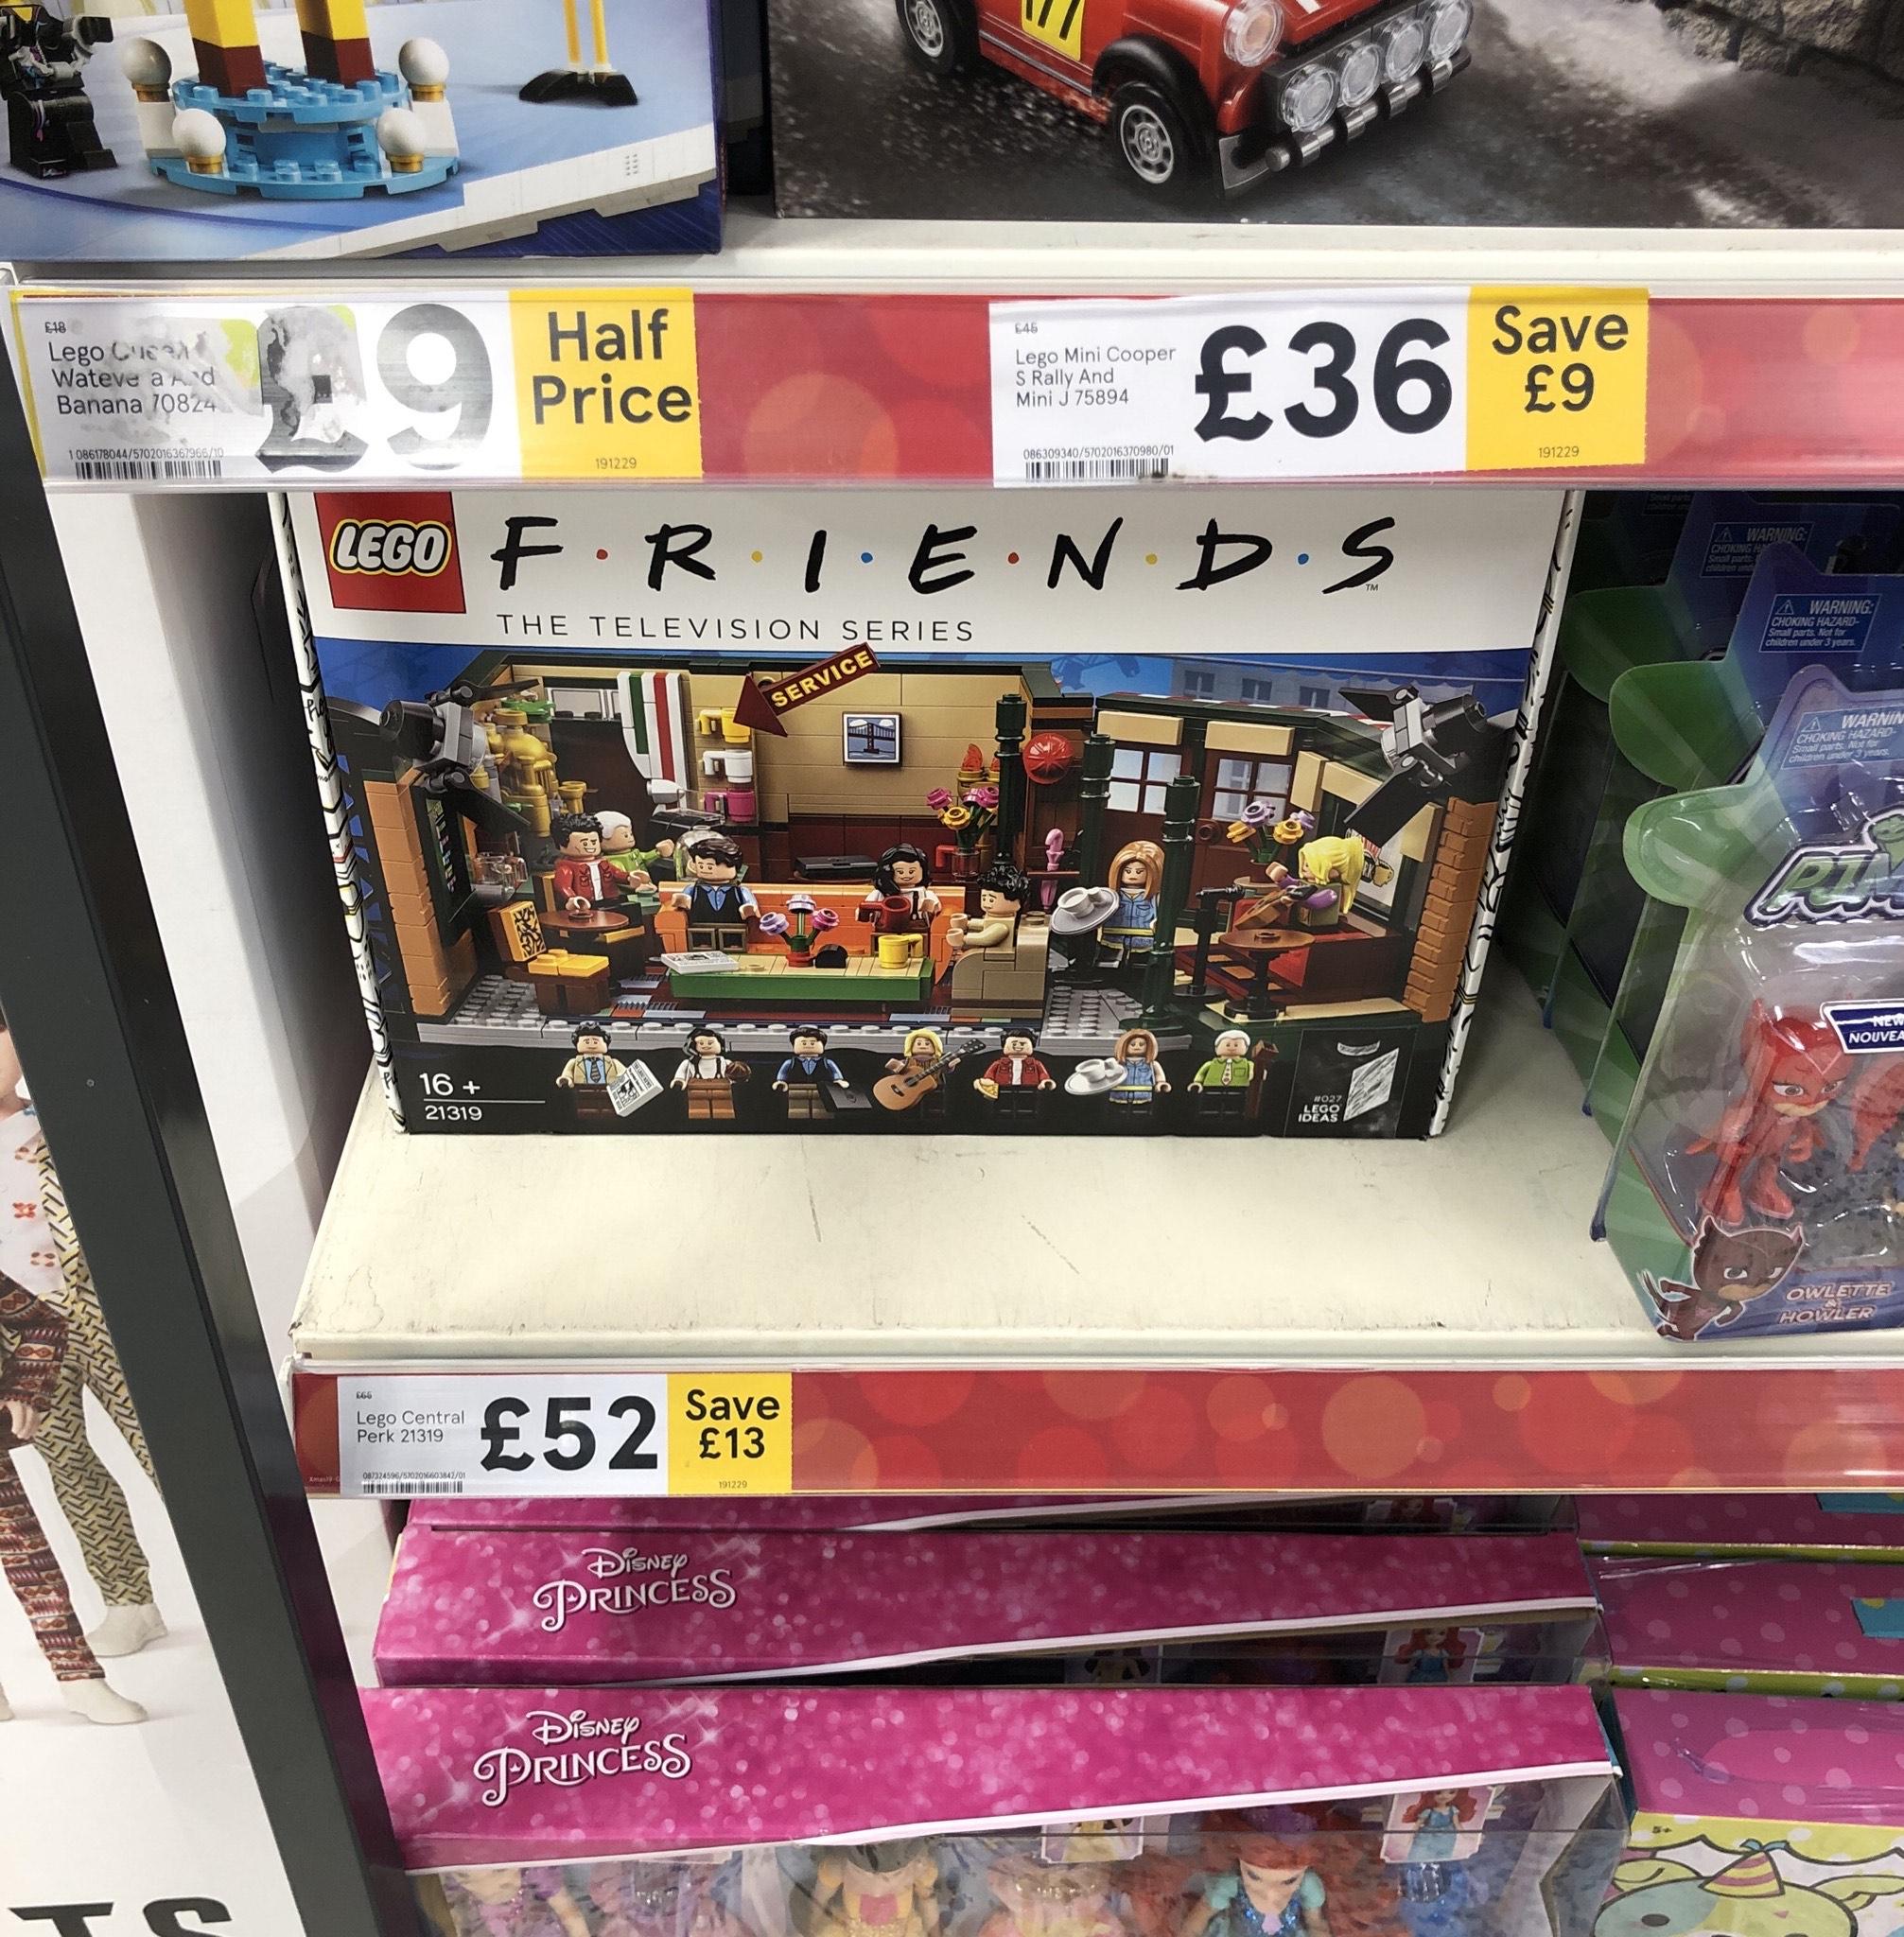 Lego FRIENDS 21319 £52 at Tesco Stockton